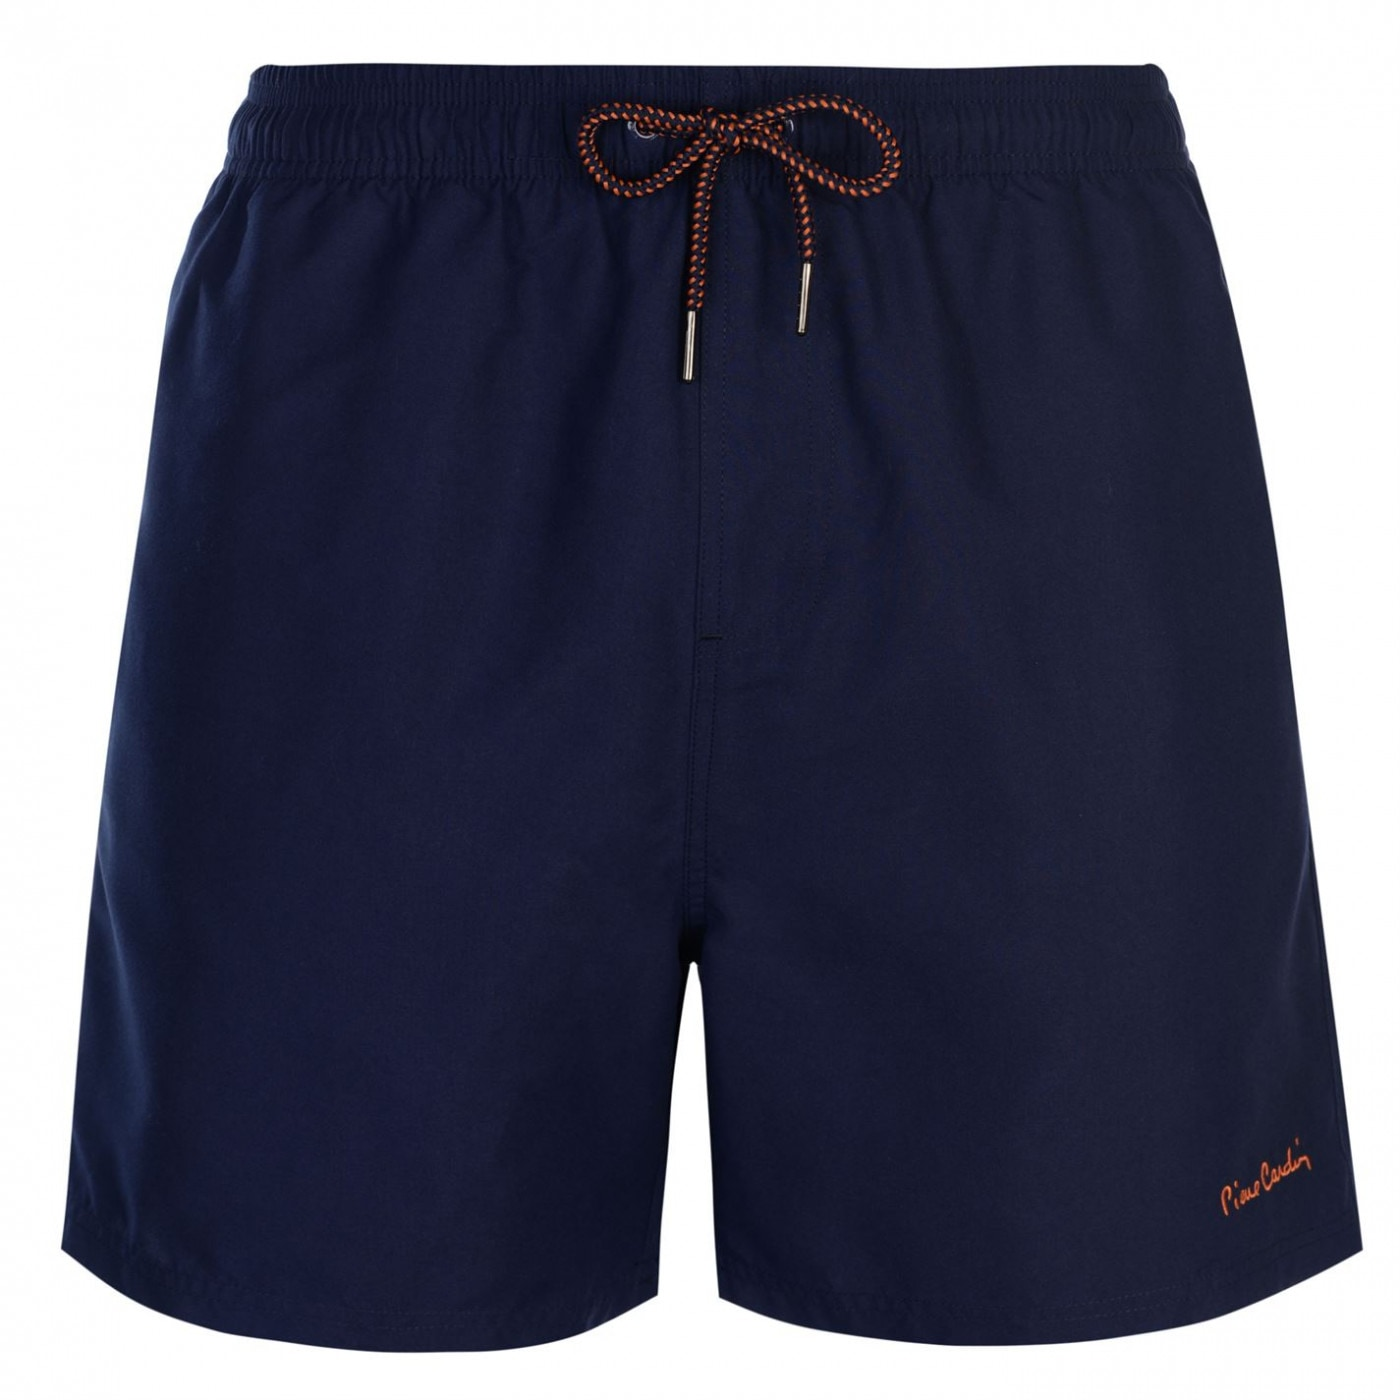 Pierre Cardin Multi Coloured Swim Shorts Mens